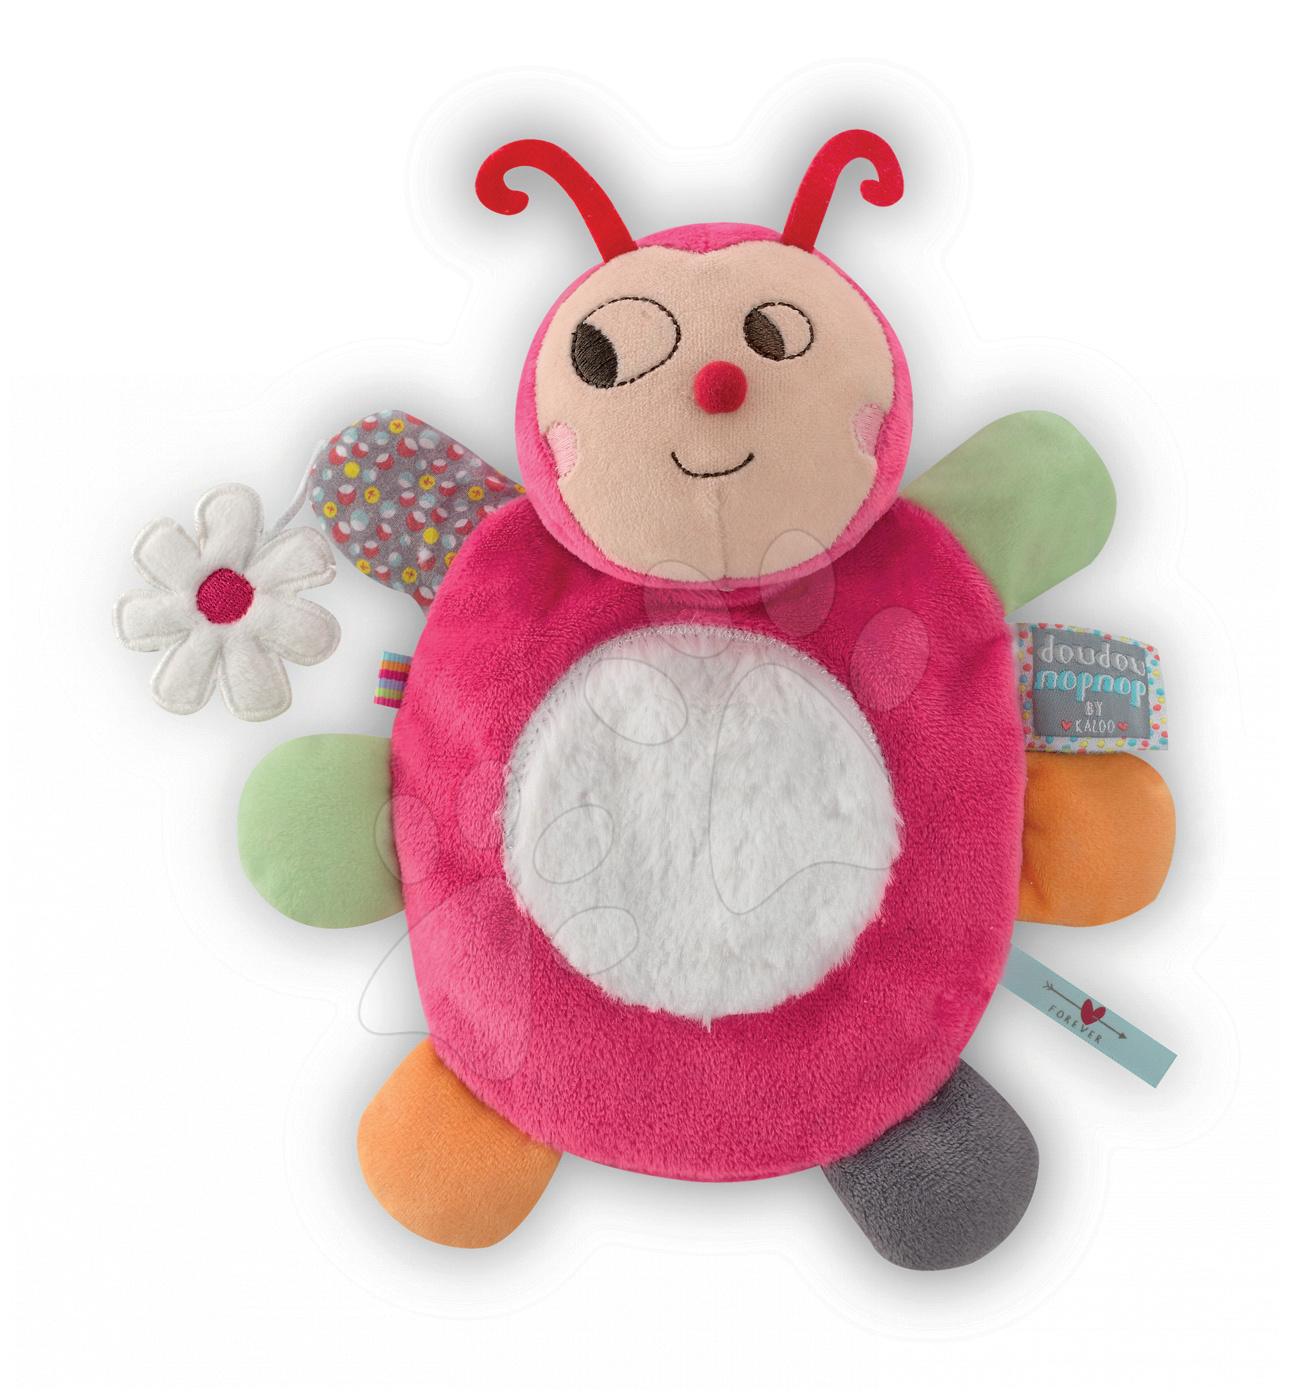 Bábky pre najmenších - Plyšová lienka bábkové divadlo Nopnop-Chance Ladybug Doudou Kaloo 25 cm pre najmenších